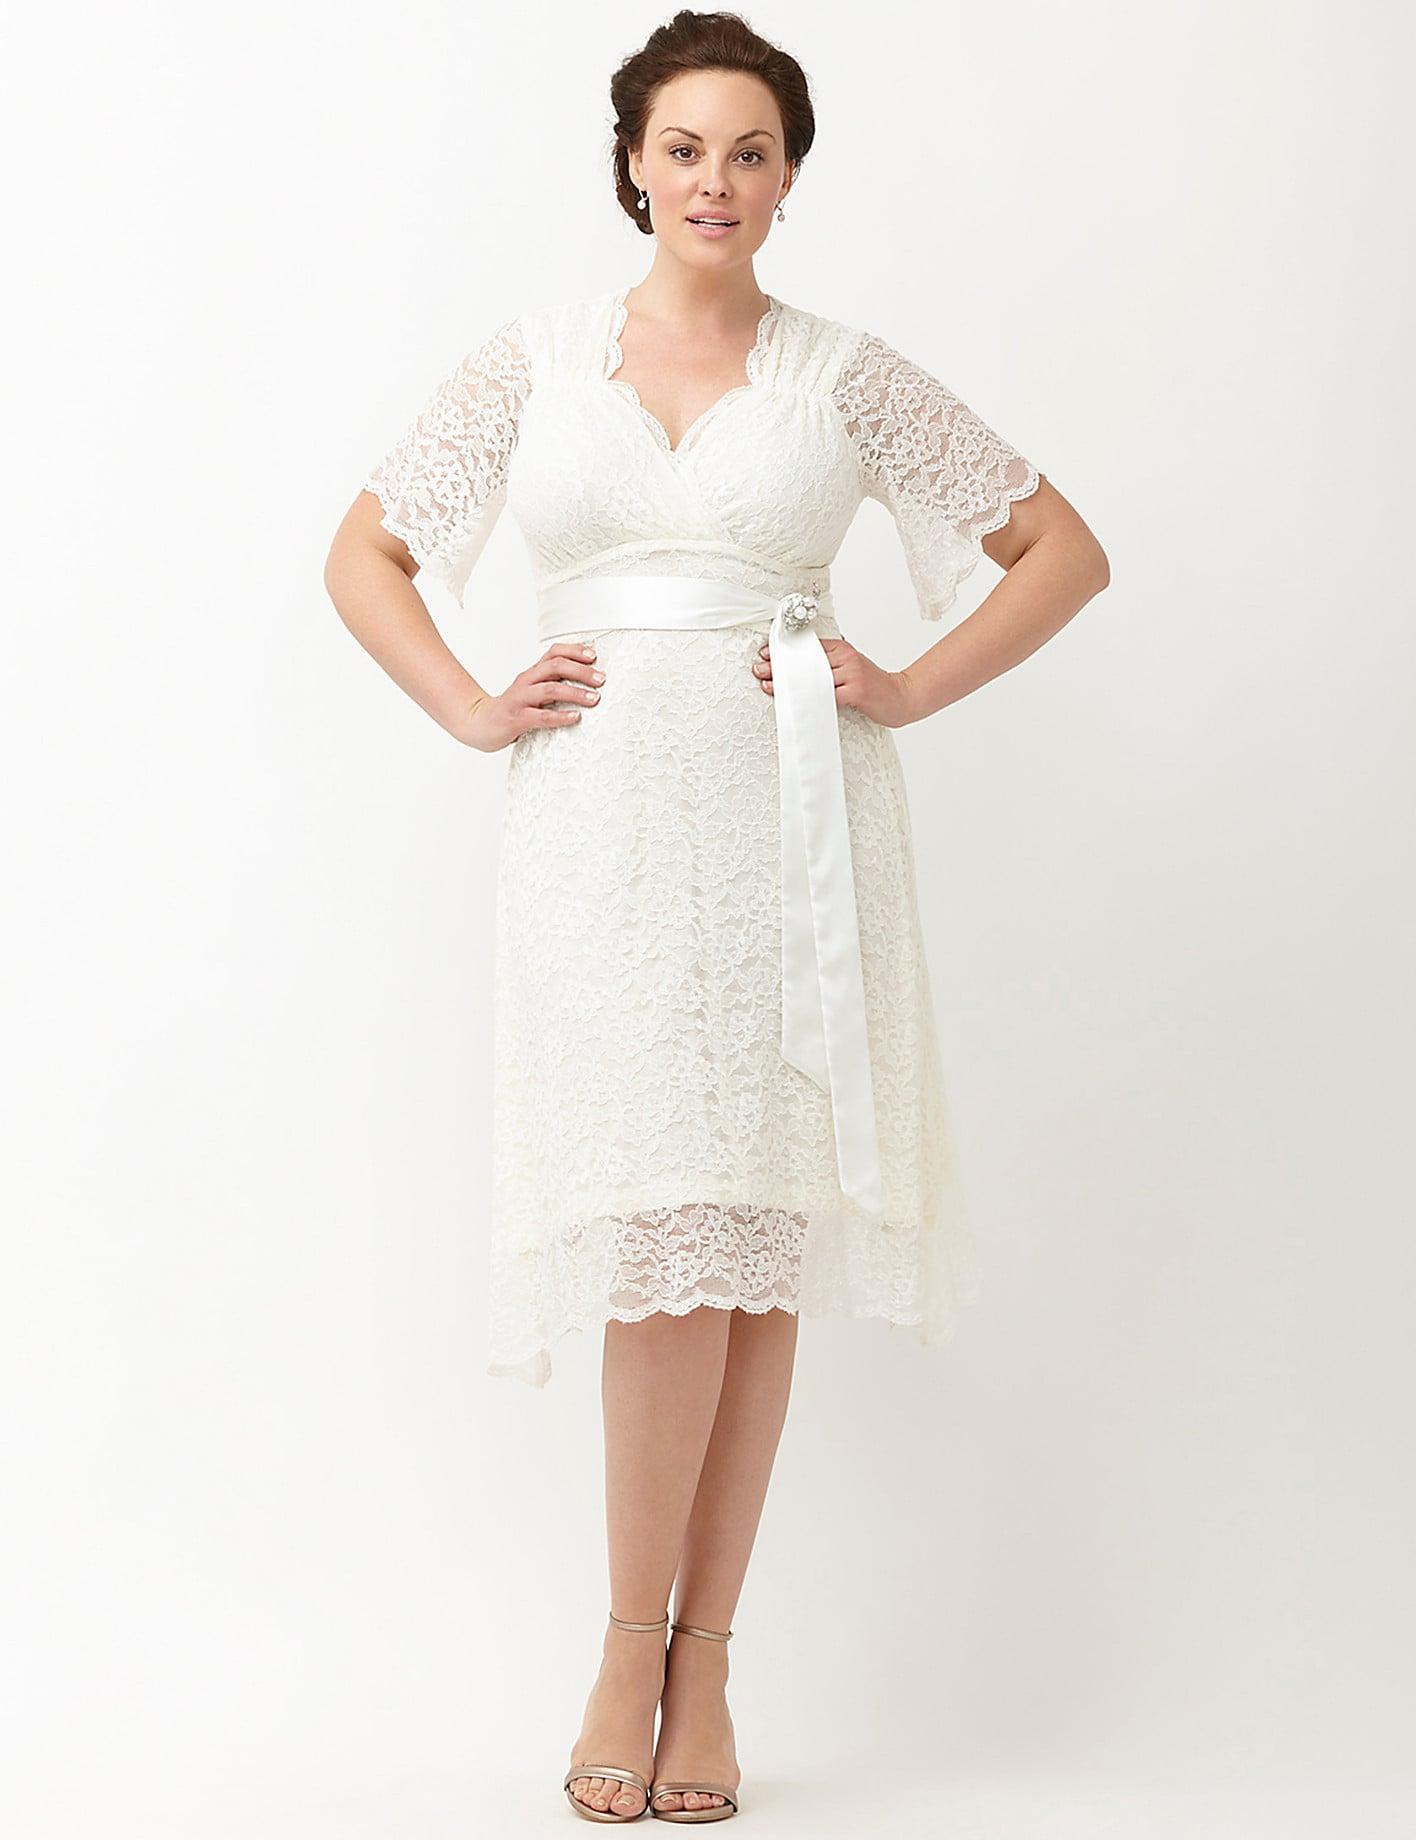 Kiyonna Lace Confection Wedding Dress 248 20 Gorgeous